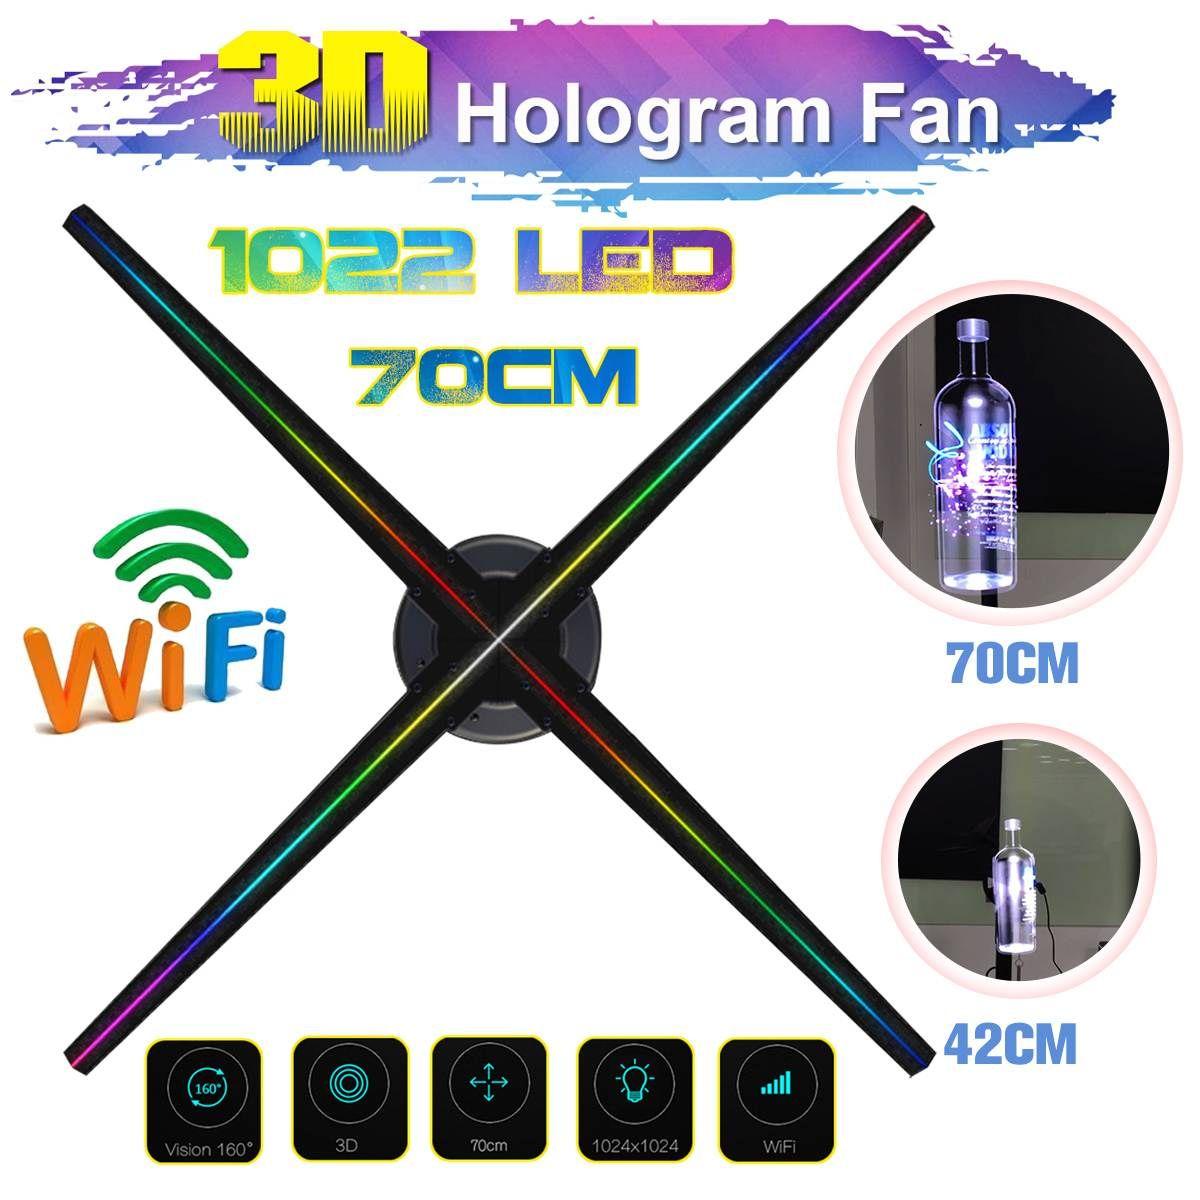 Verbesserte 70 cm Wifi 3D Holographische Projektor Fan Hologramm Player LED Video Display Fan Werbung Licht APP Control Vier Axil